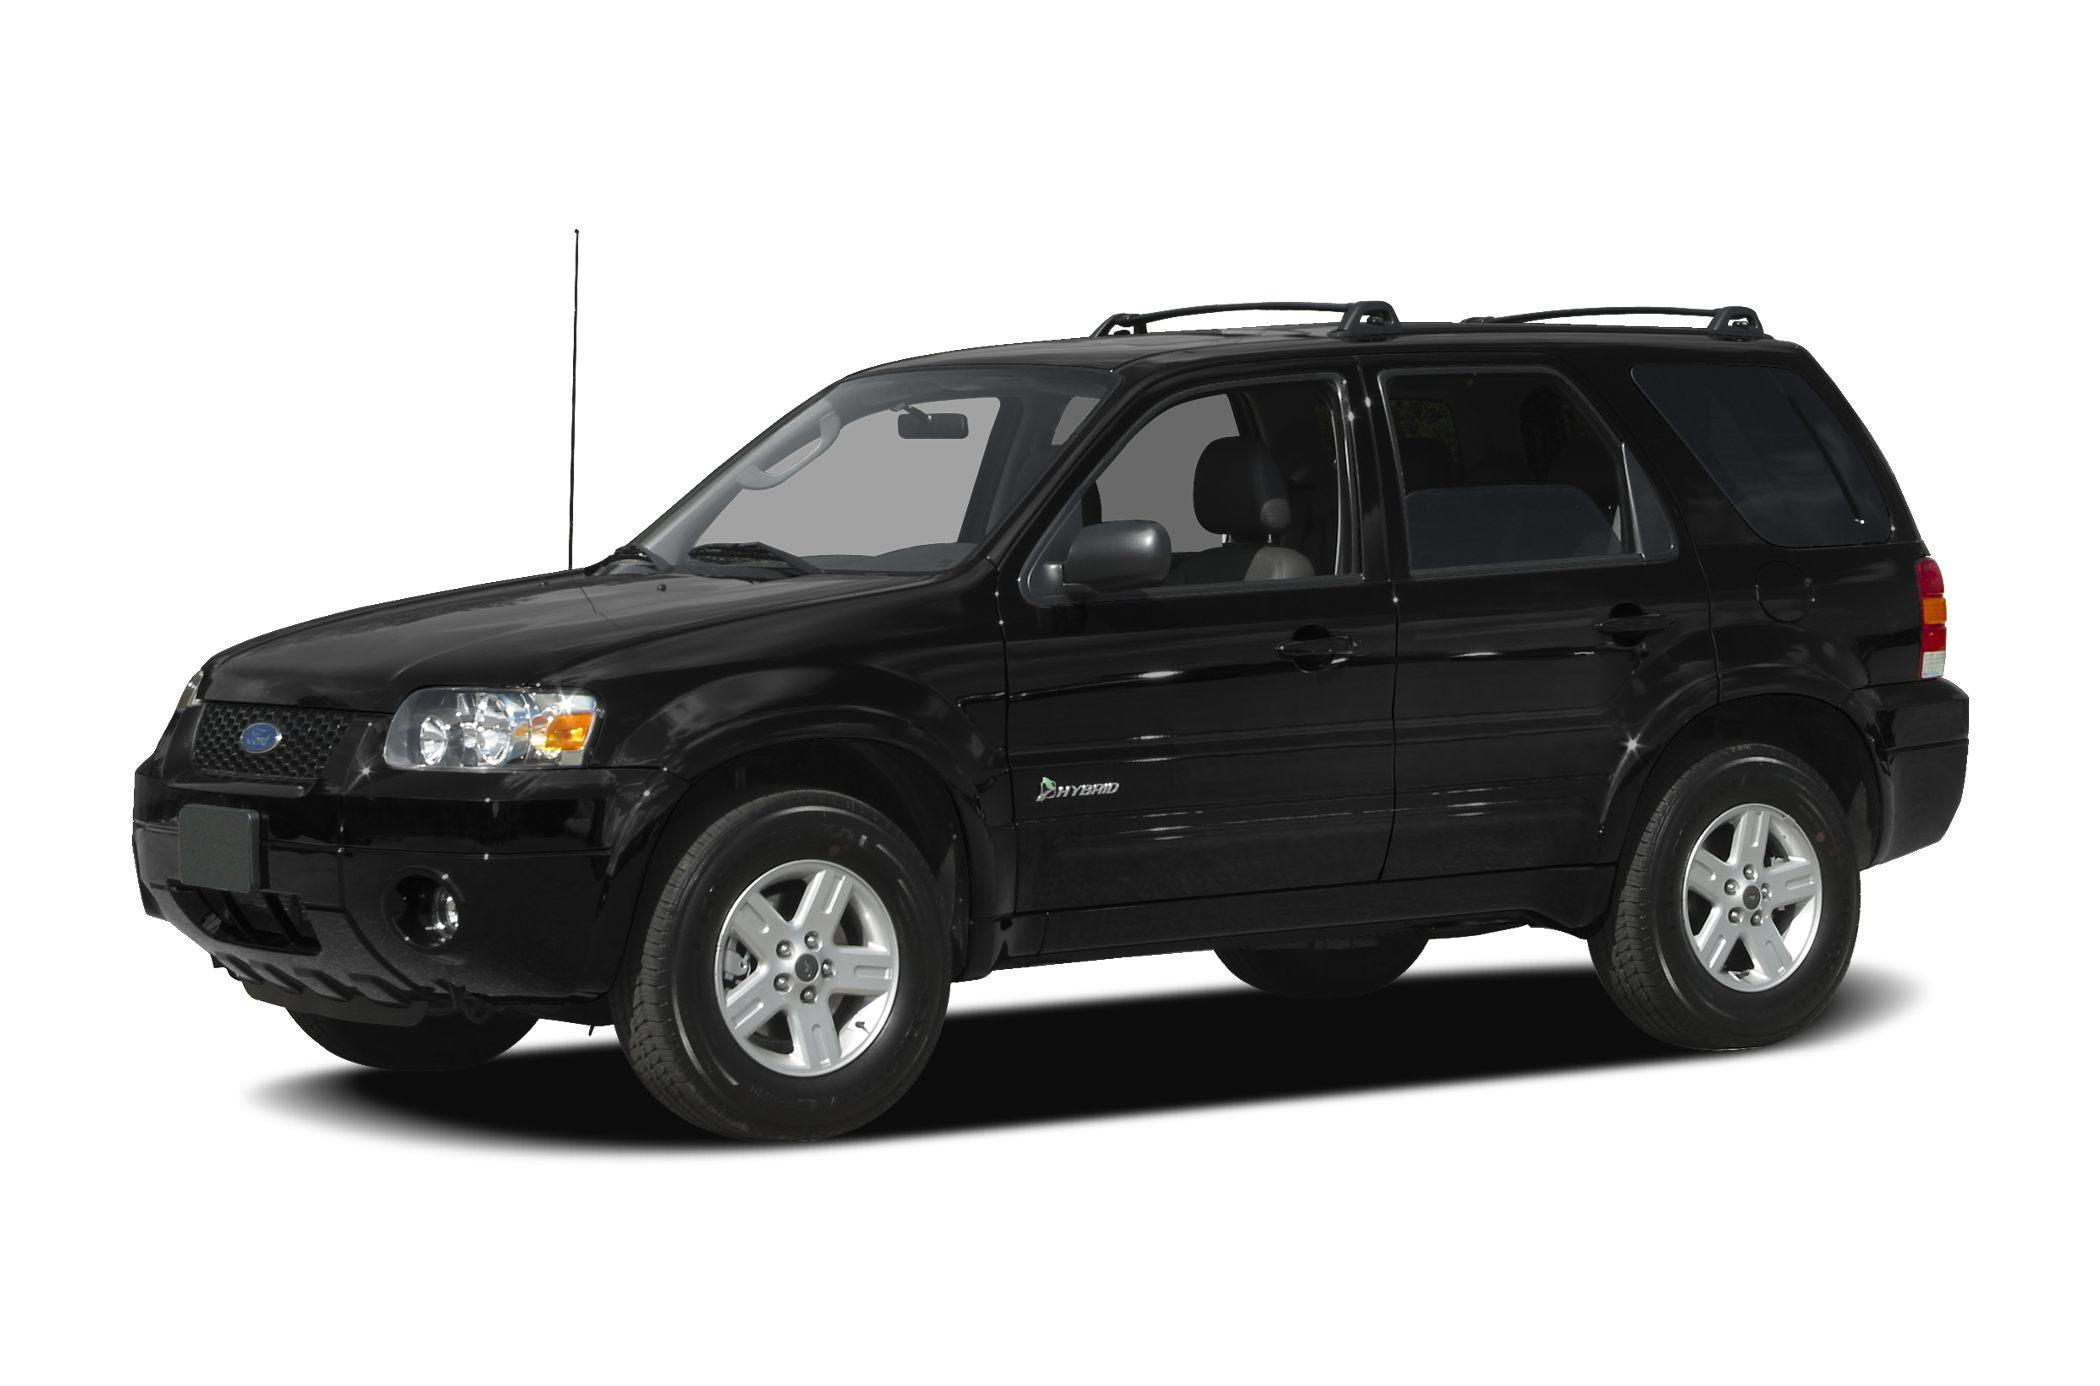 2007 Ford Escape Hybrid Recalls